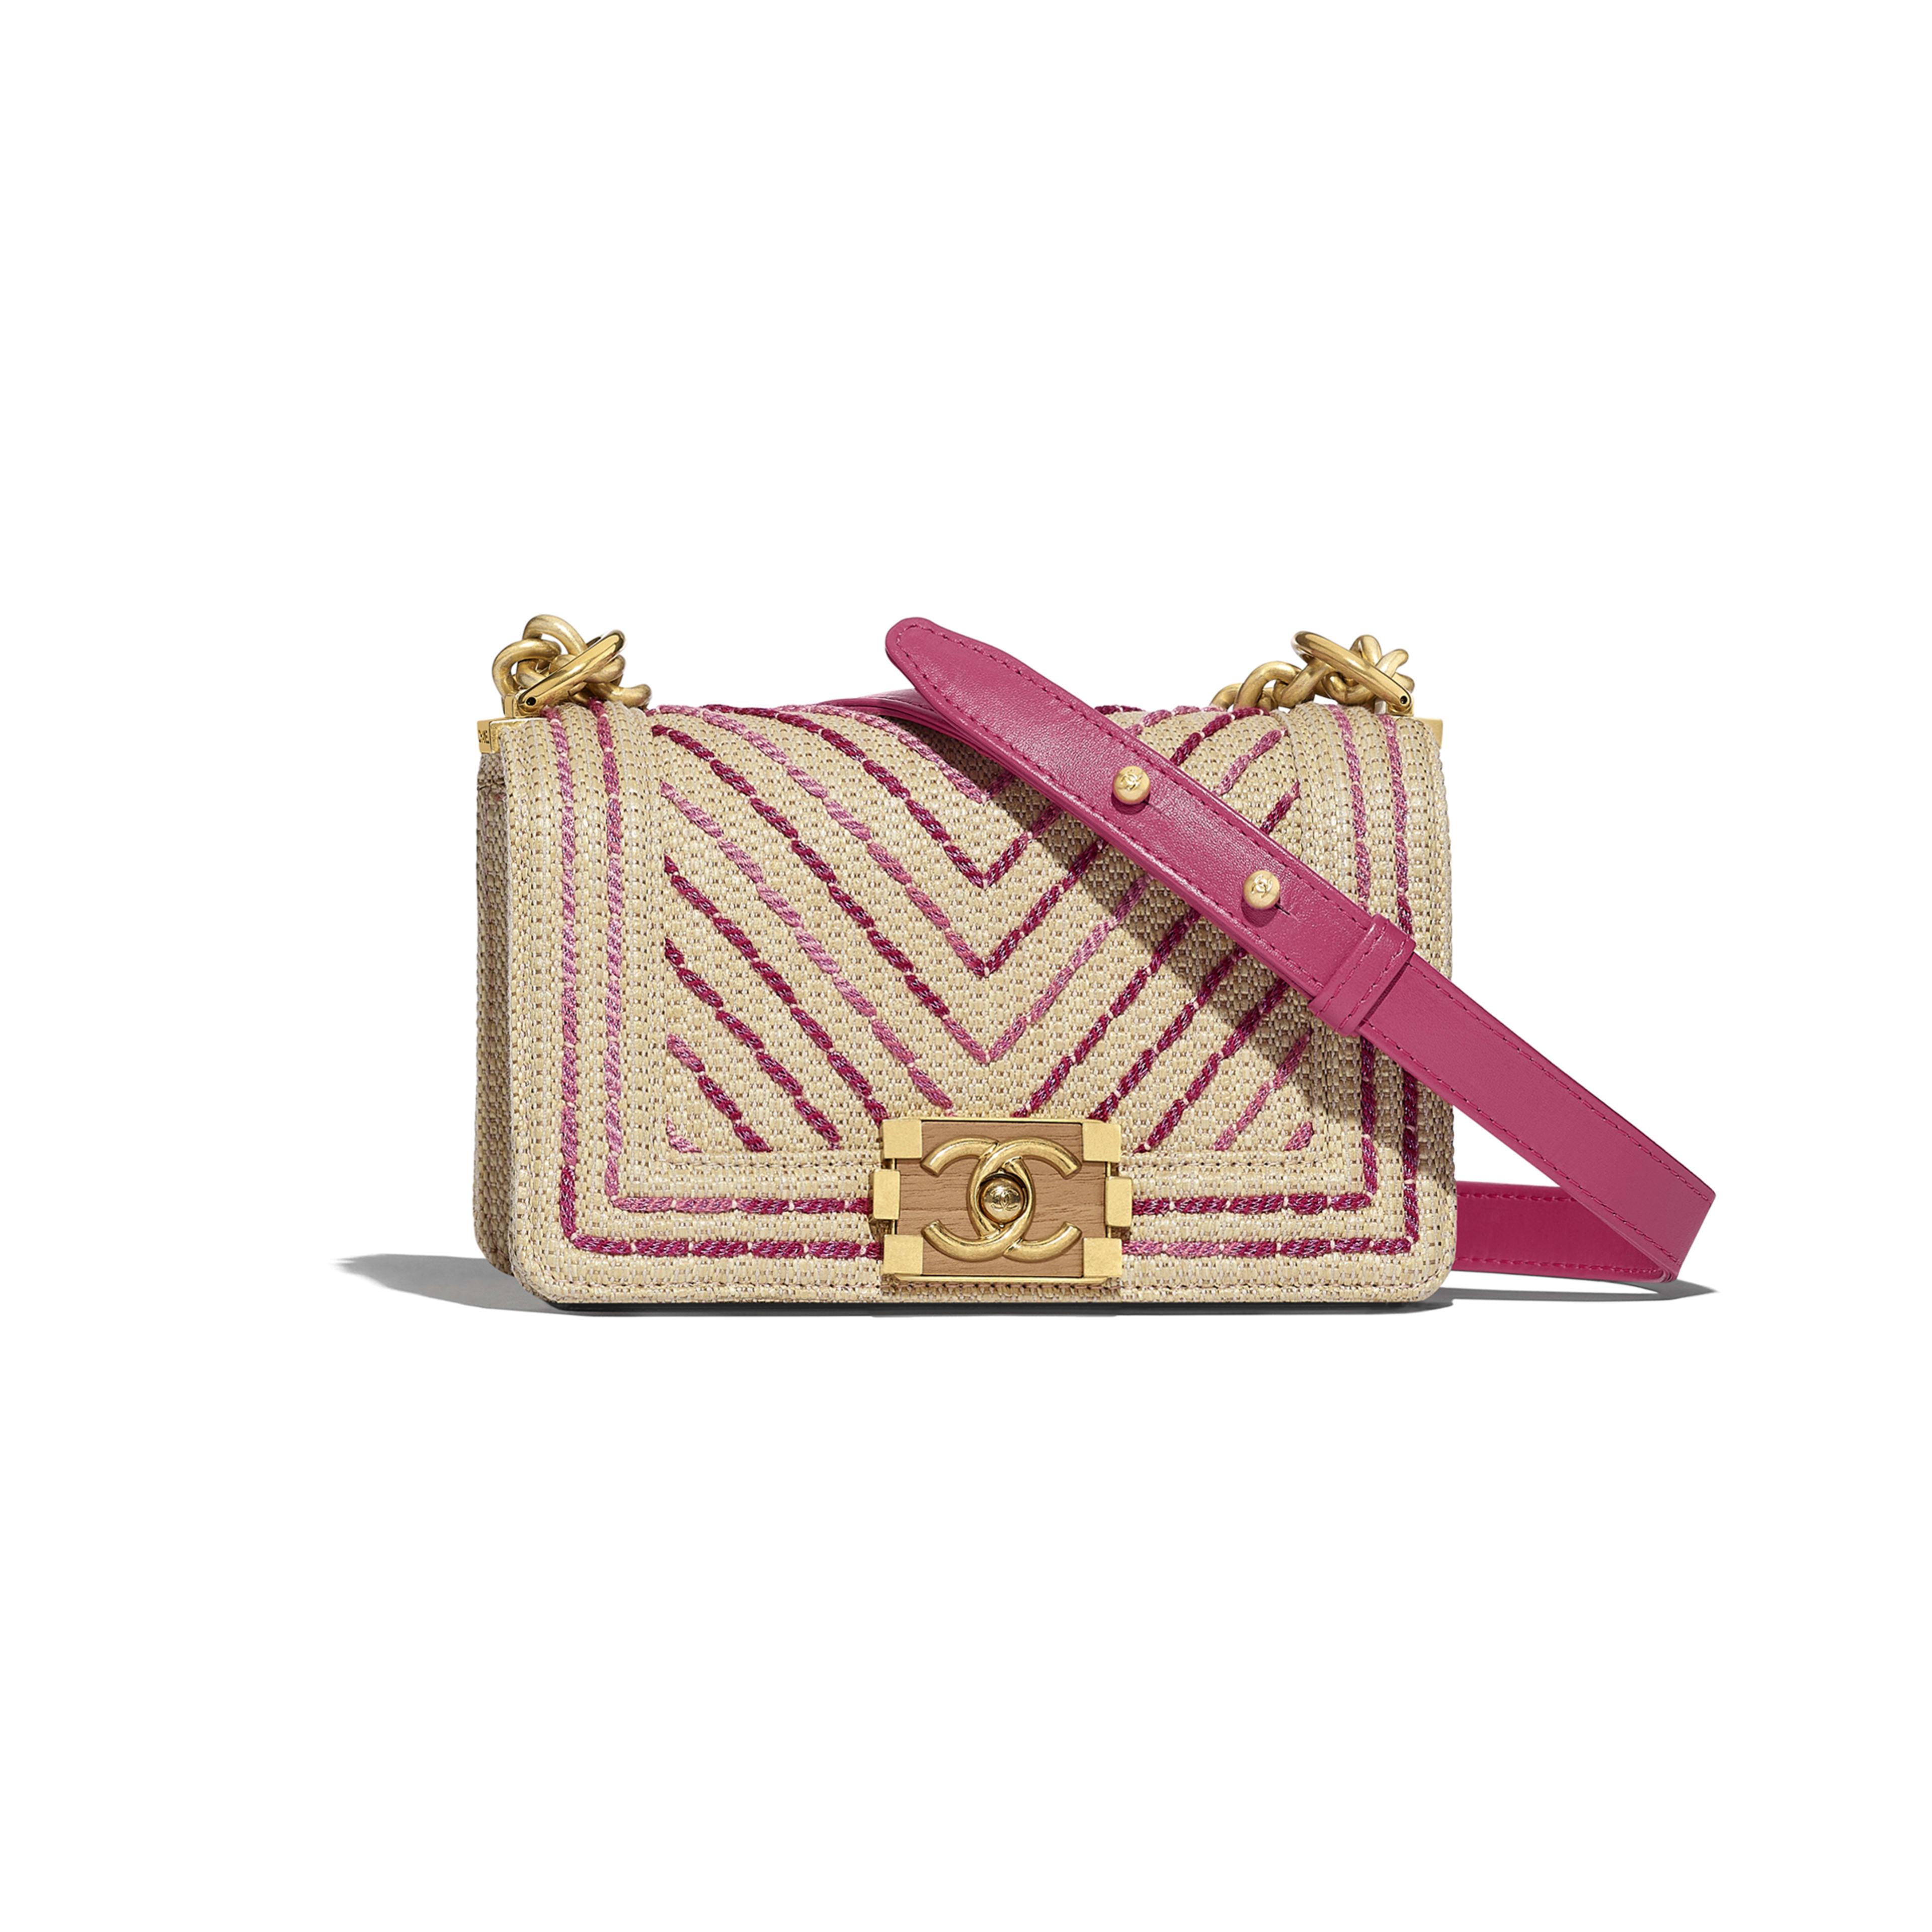 Small BOY CHANEL Handbag - Beige & Pink - Cotton, Mixed Fibers, Calfskin & Gold-Tone Metal - Default view - see full sized version